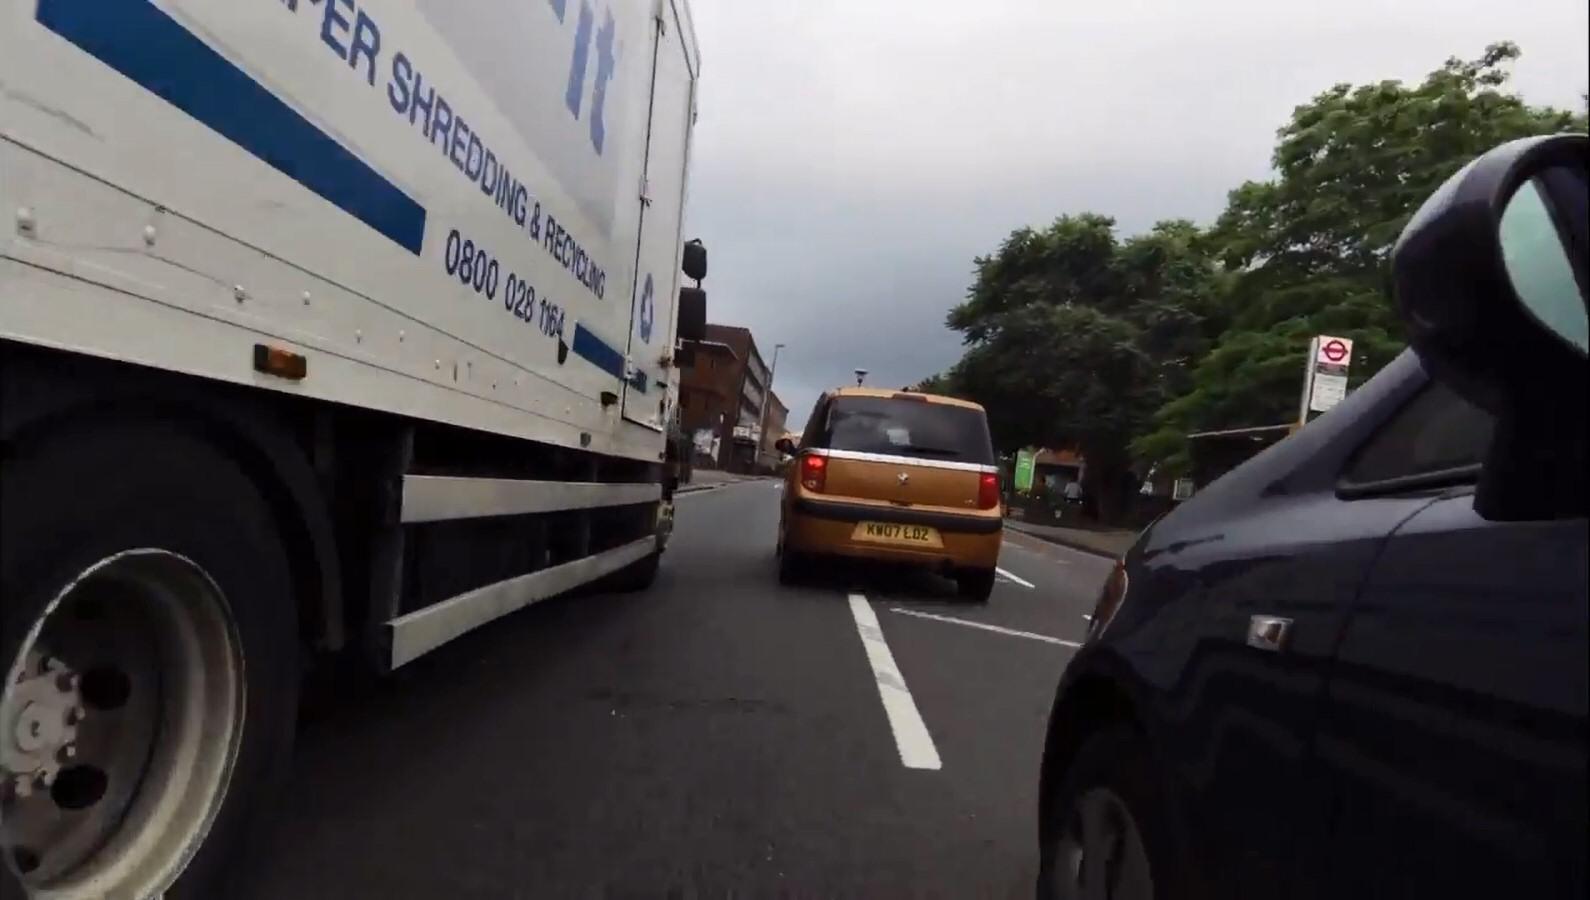 A close pass alongside a parked van.